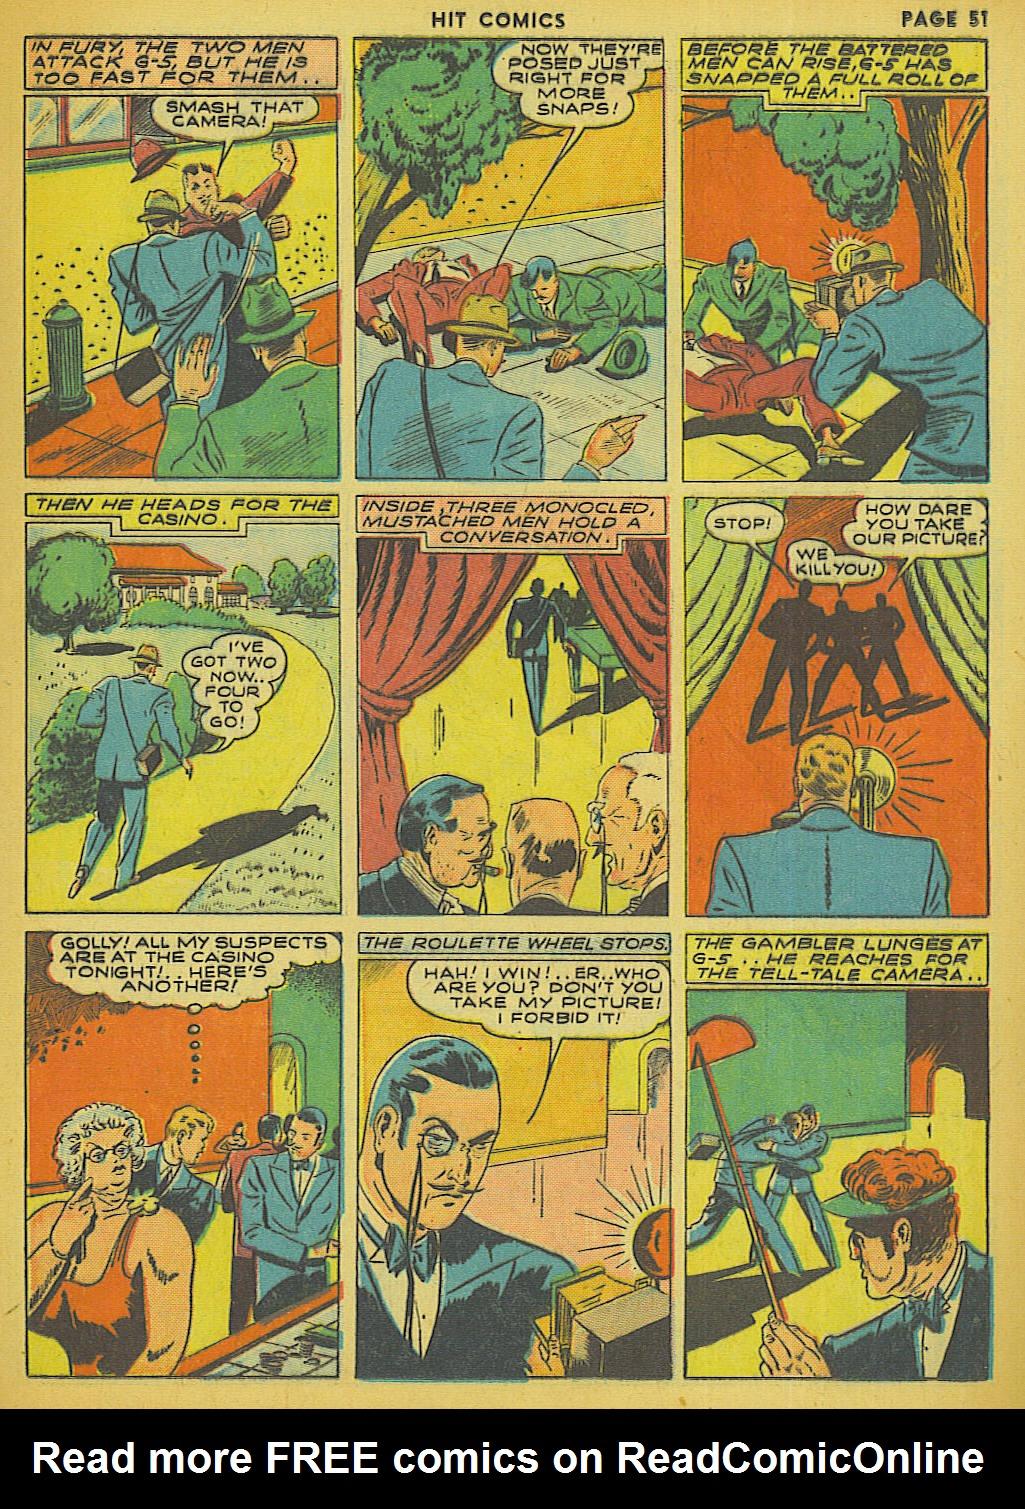 Read online Hit Comics comic -  Issue #13 - 53